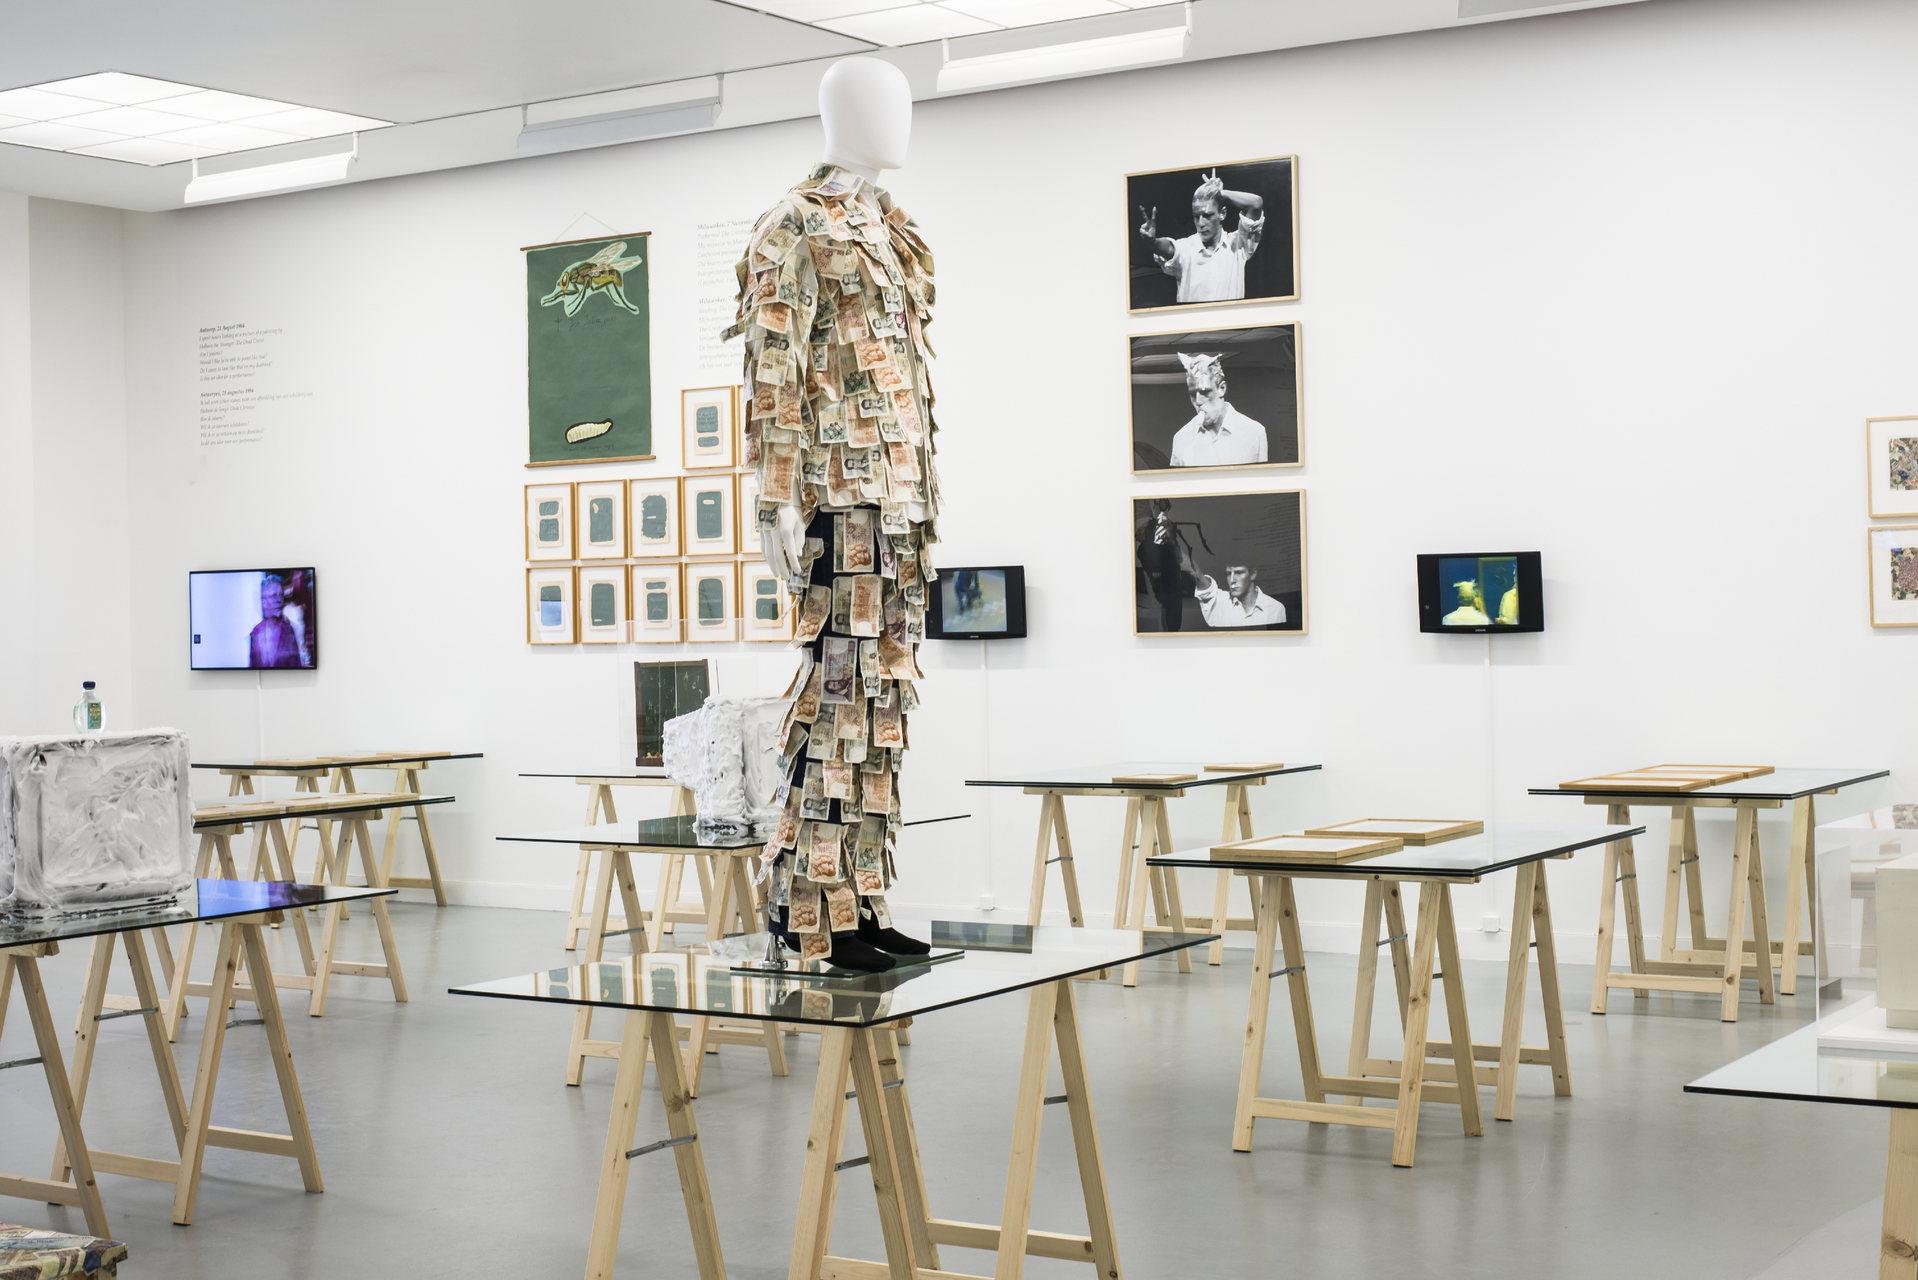 Jan_Fabre,_exhibition_view_M_HKA_2015_photo_M_HKAclinckx11